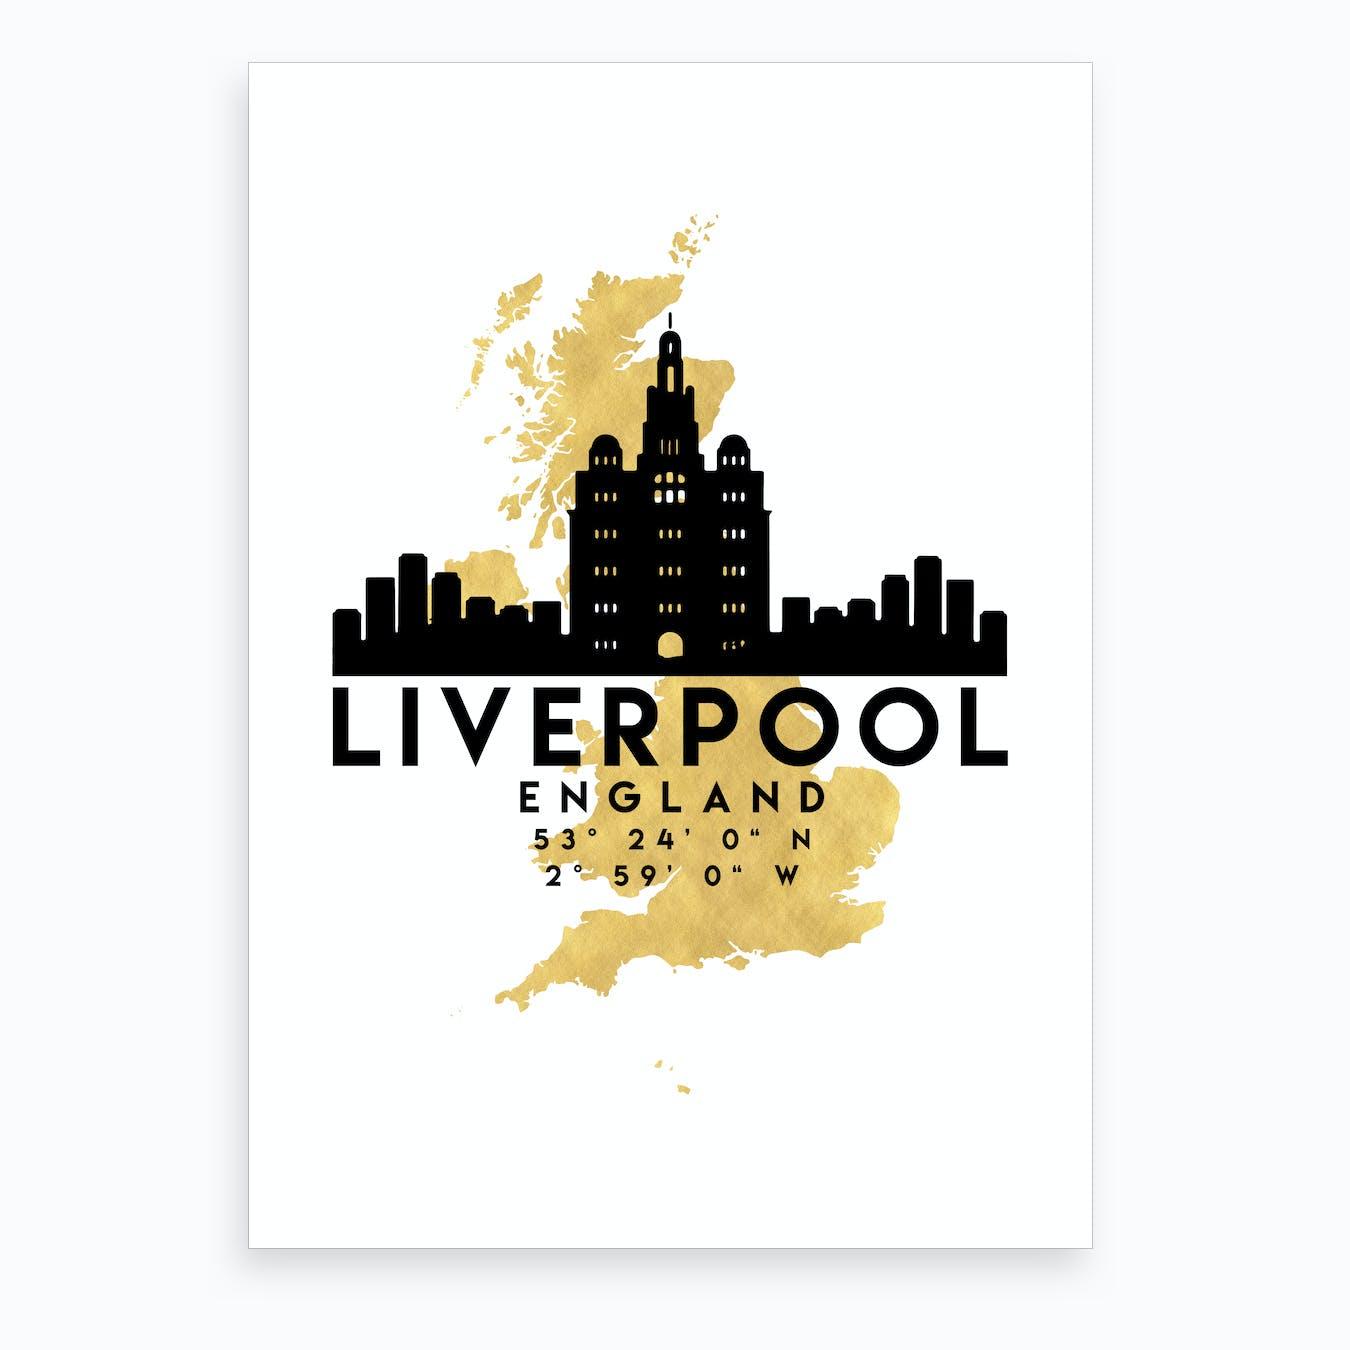 Liverpool England Silhouette City Skyline Map